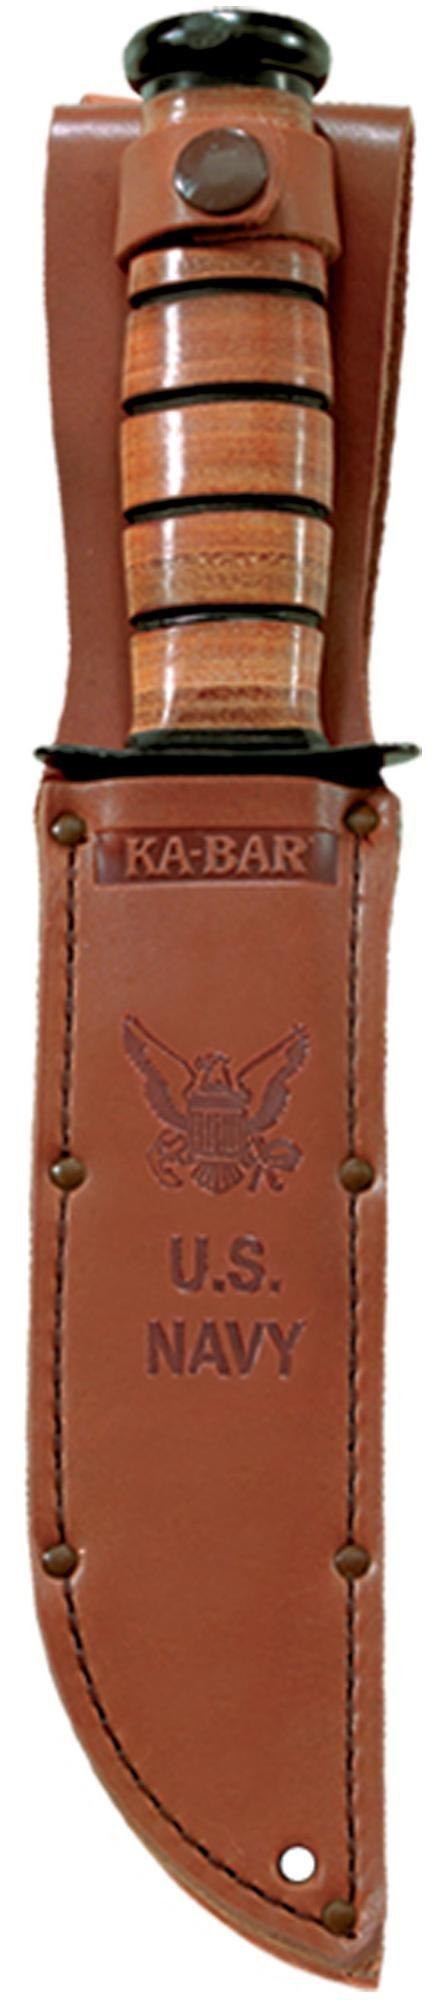 "KA-BAR® US Navy - 7"" Blade Straight Edge (1225)"